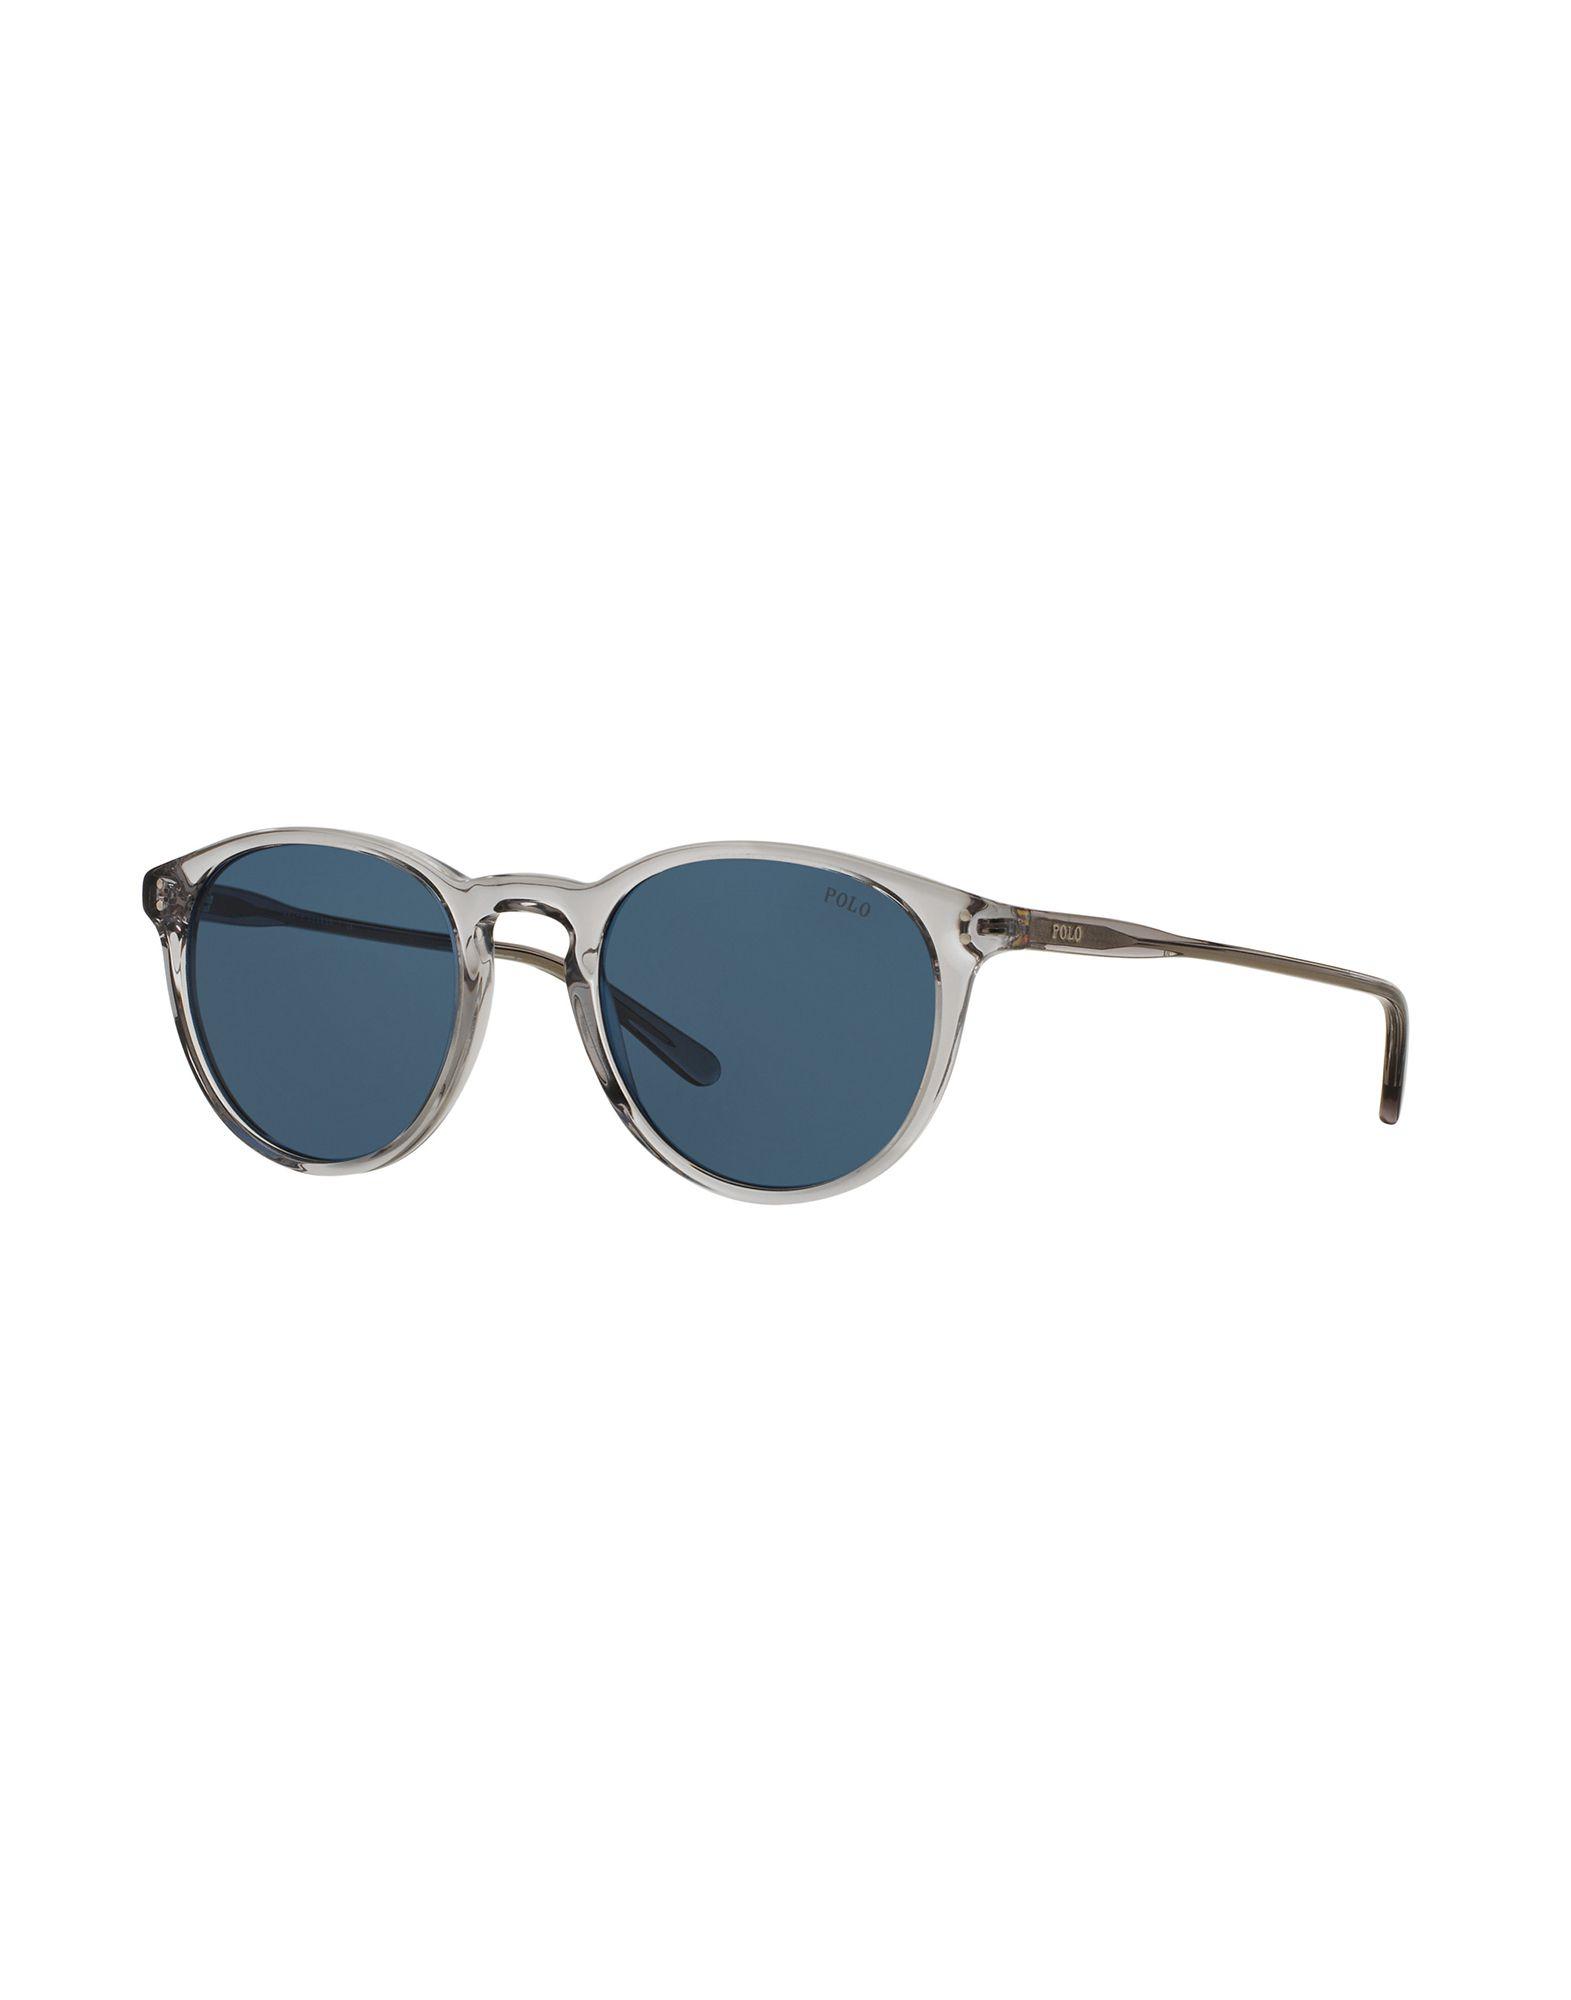 Polo Ralph Lauren Sunglasses In Transparent